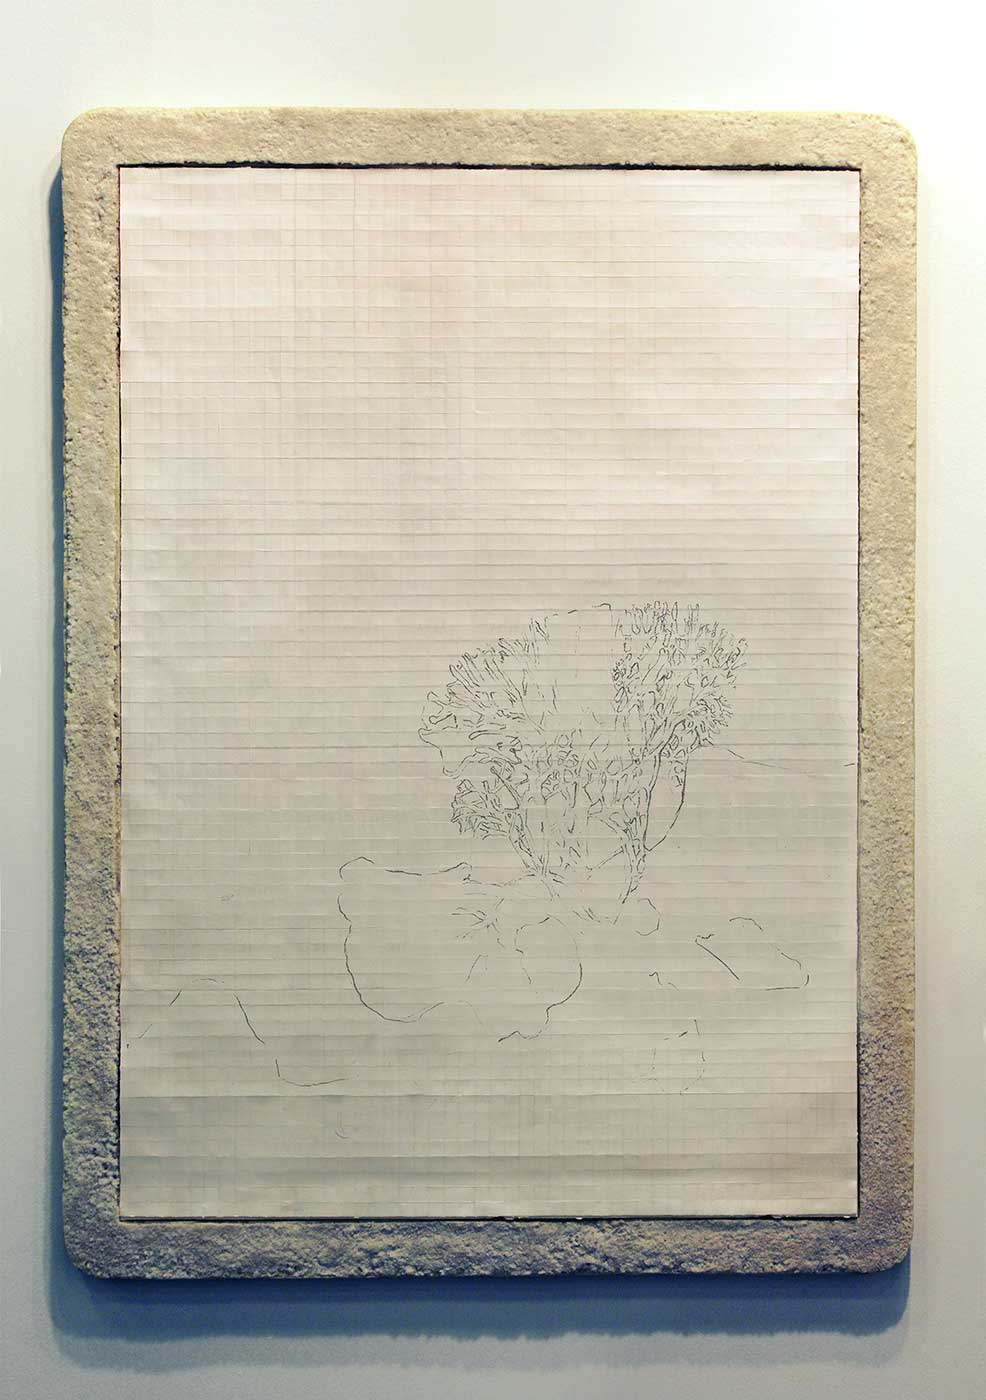 graphite on paper, frame on sea salt